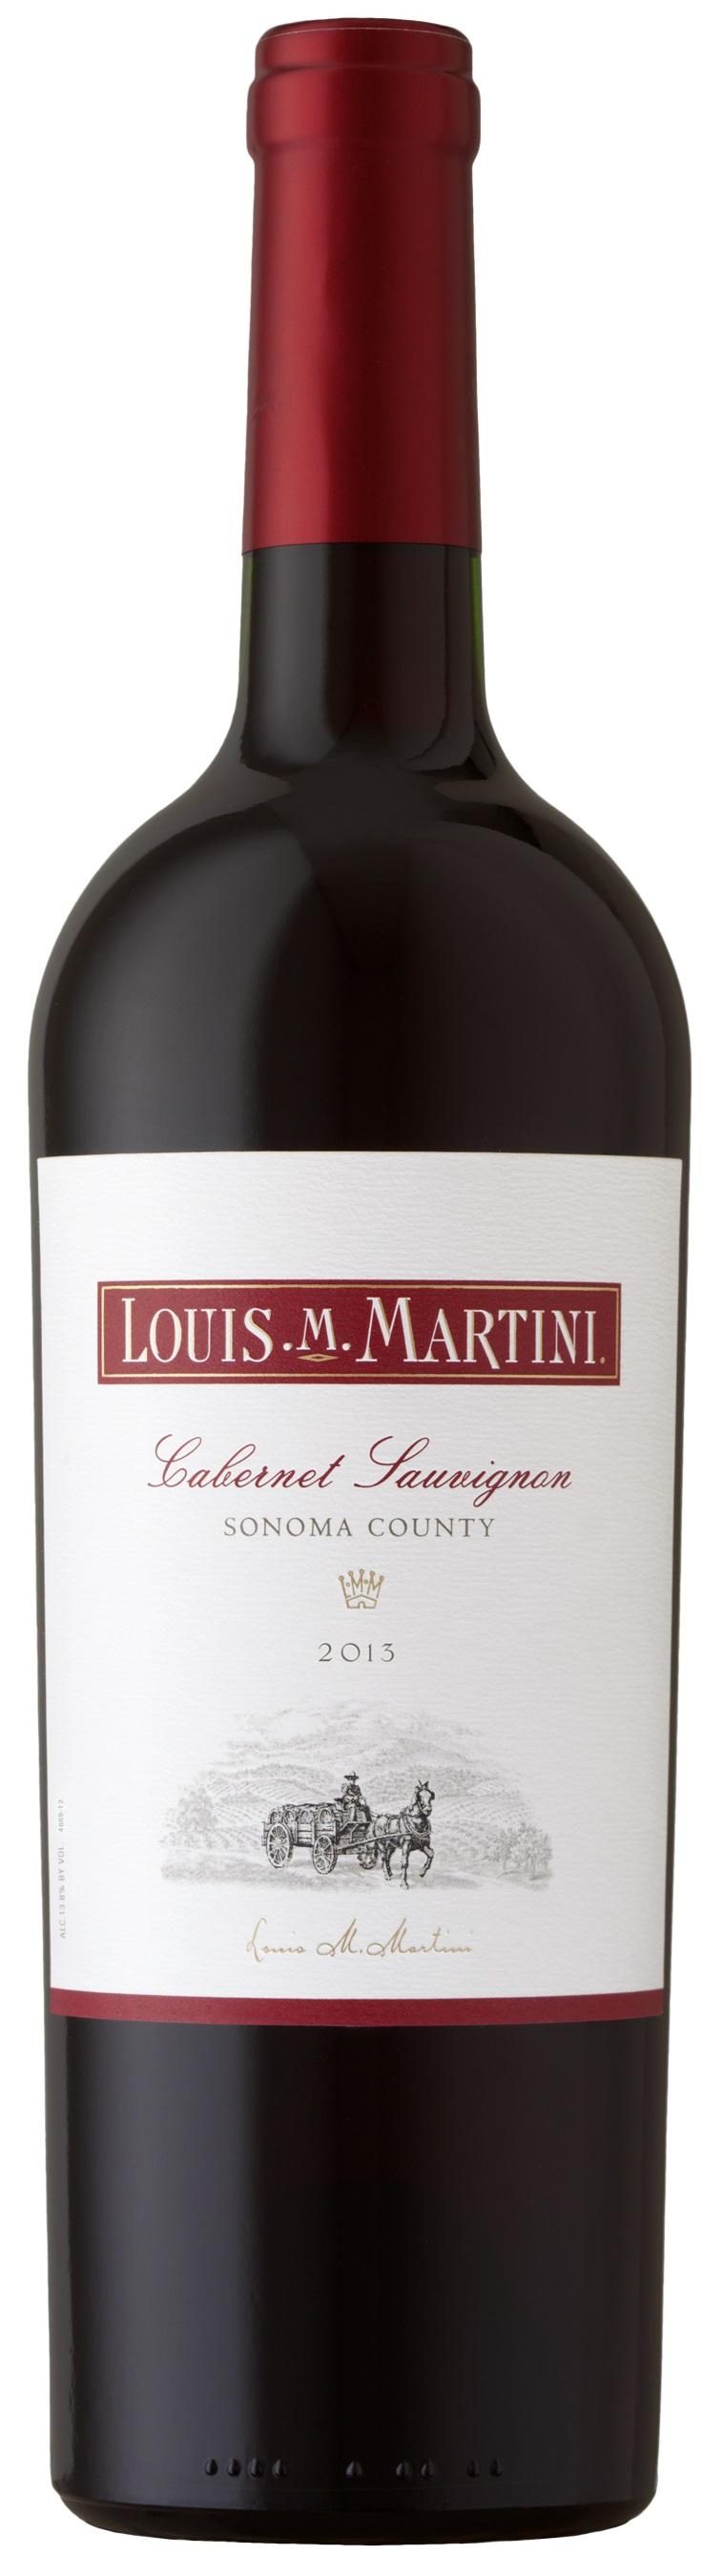 Caudalia Wine Box Agosto 2016 Bodega Luis M. Martini Cabernet Sauvignon 2013